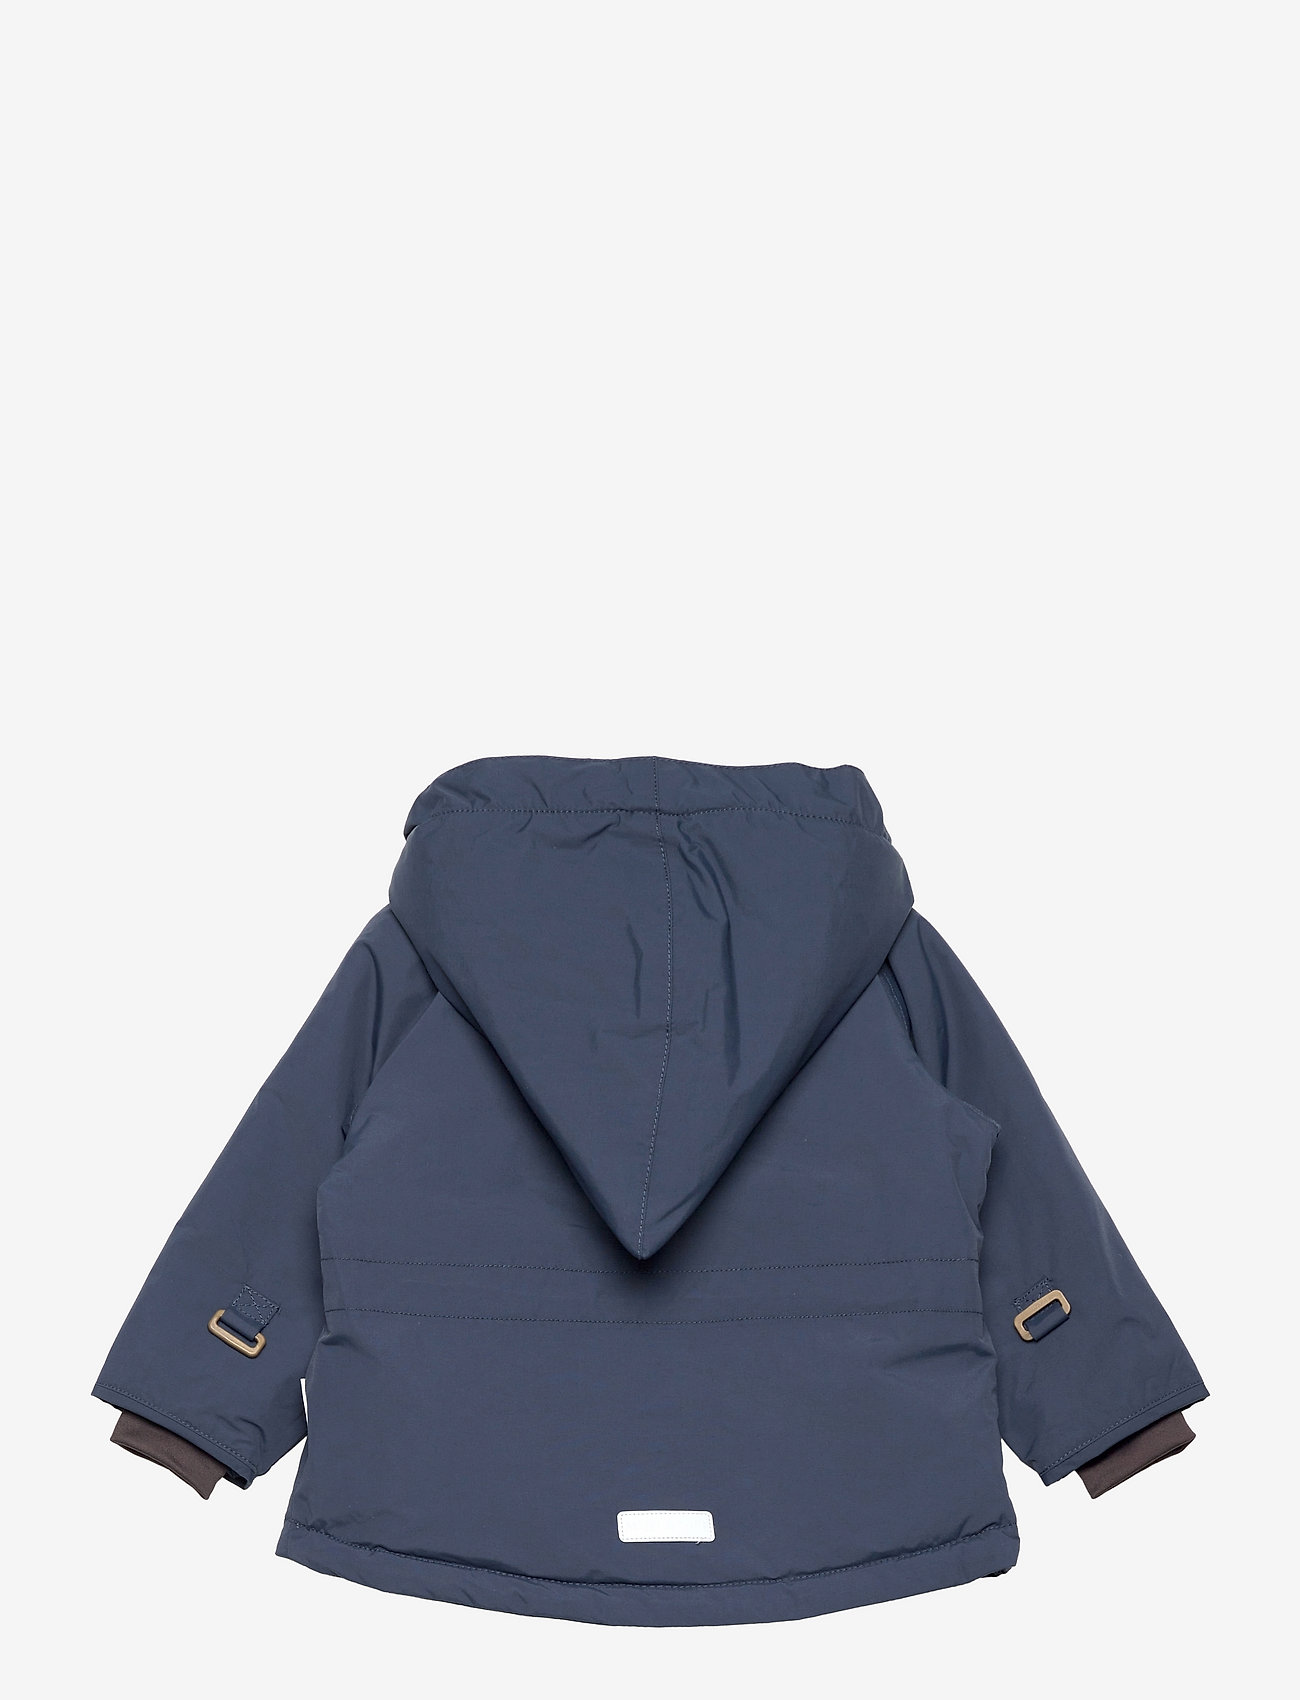 Mini A Ture - Wang Jacket, M - winter jacket - blue nights - 1